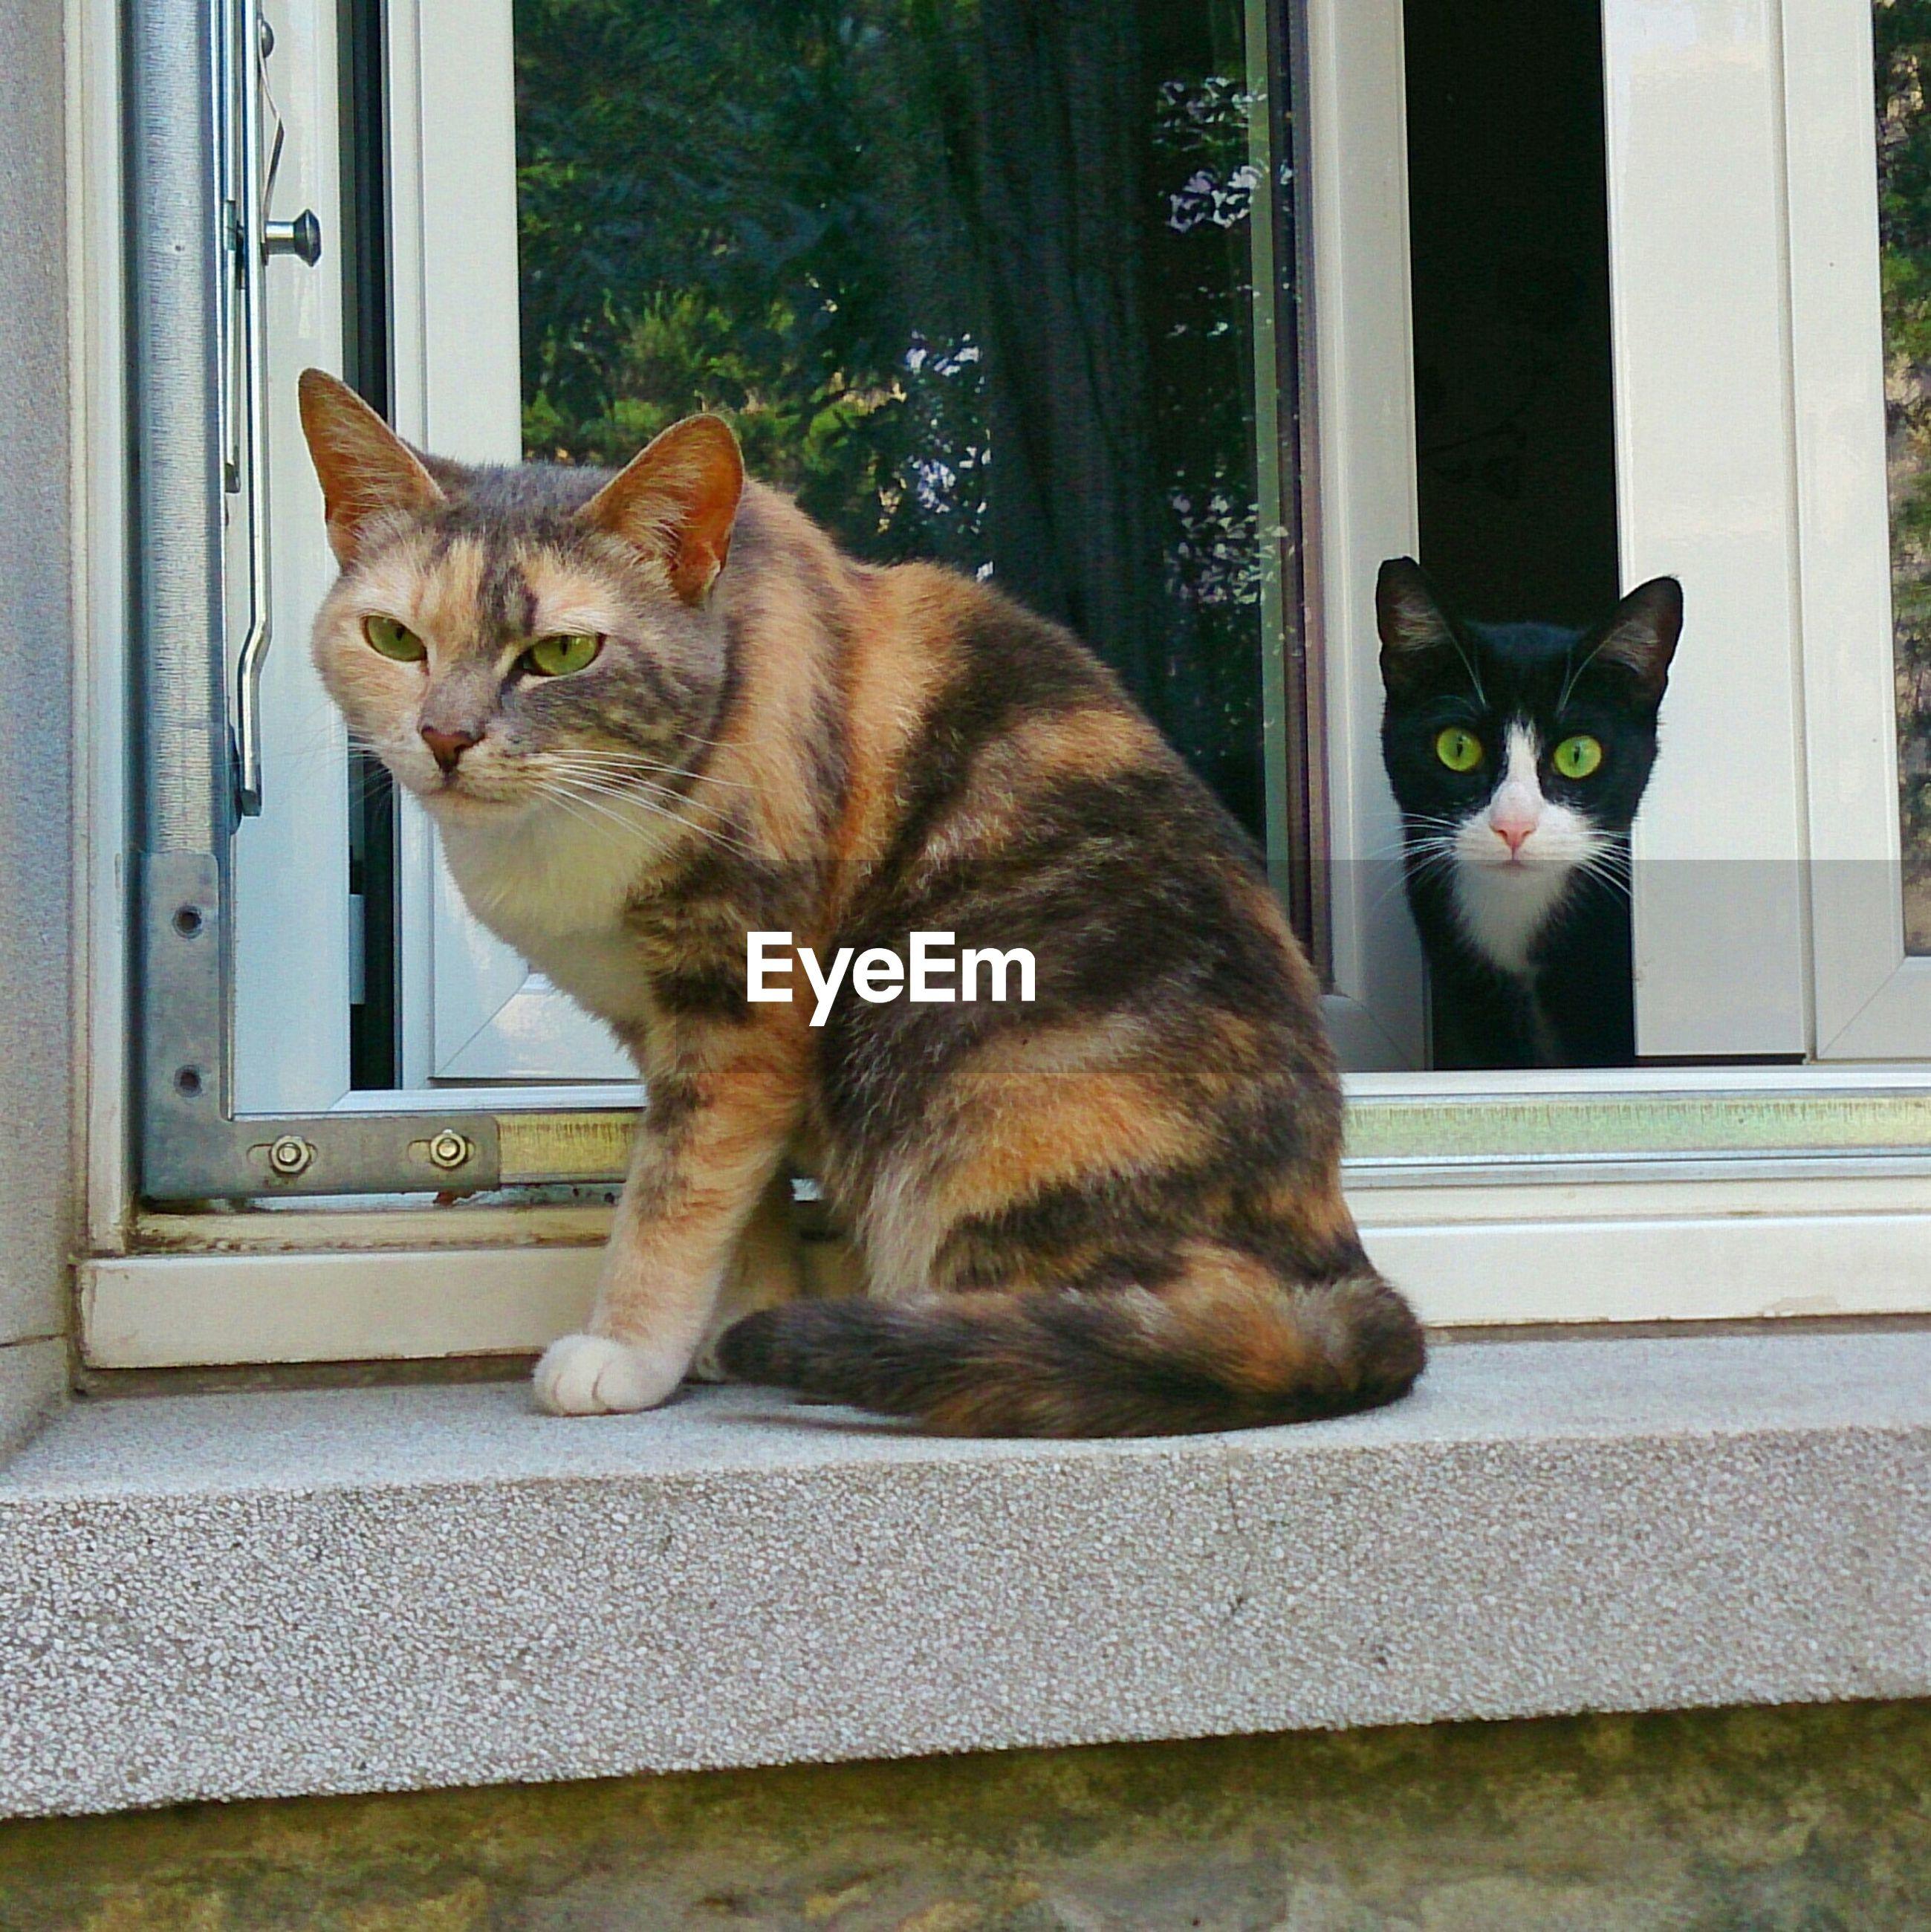 Cats sitting on window sill